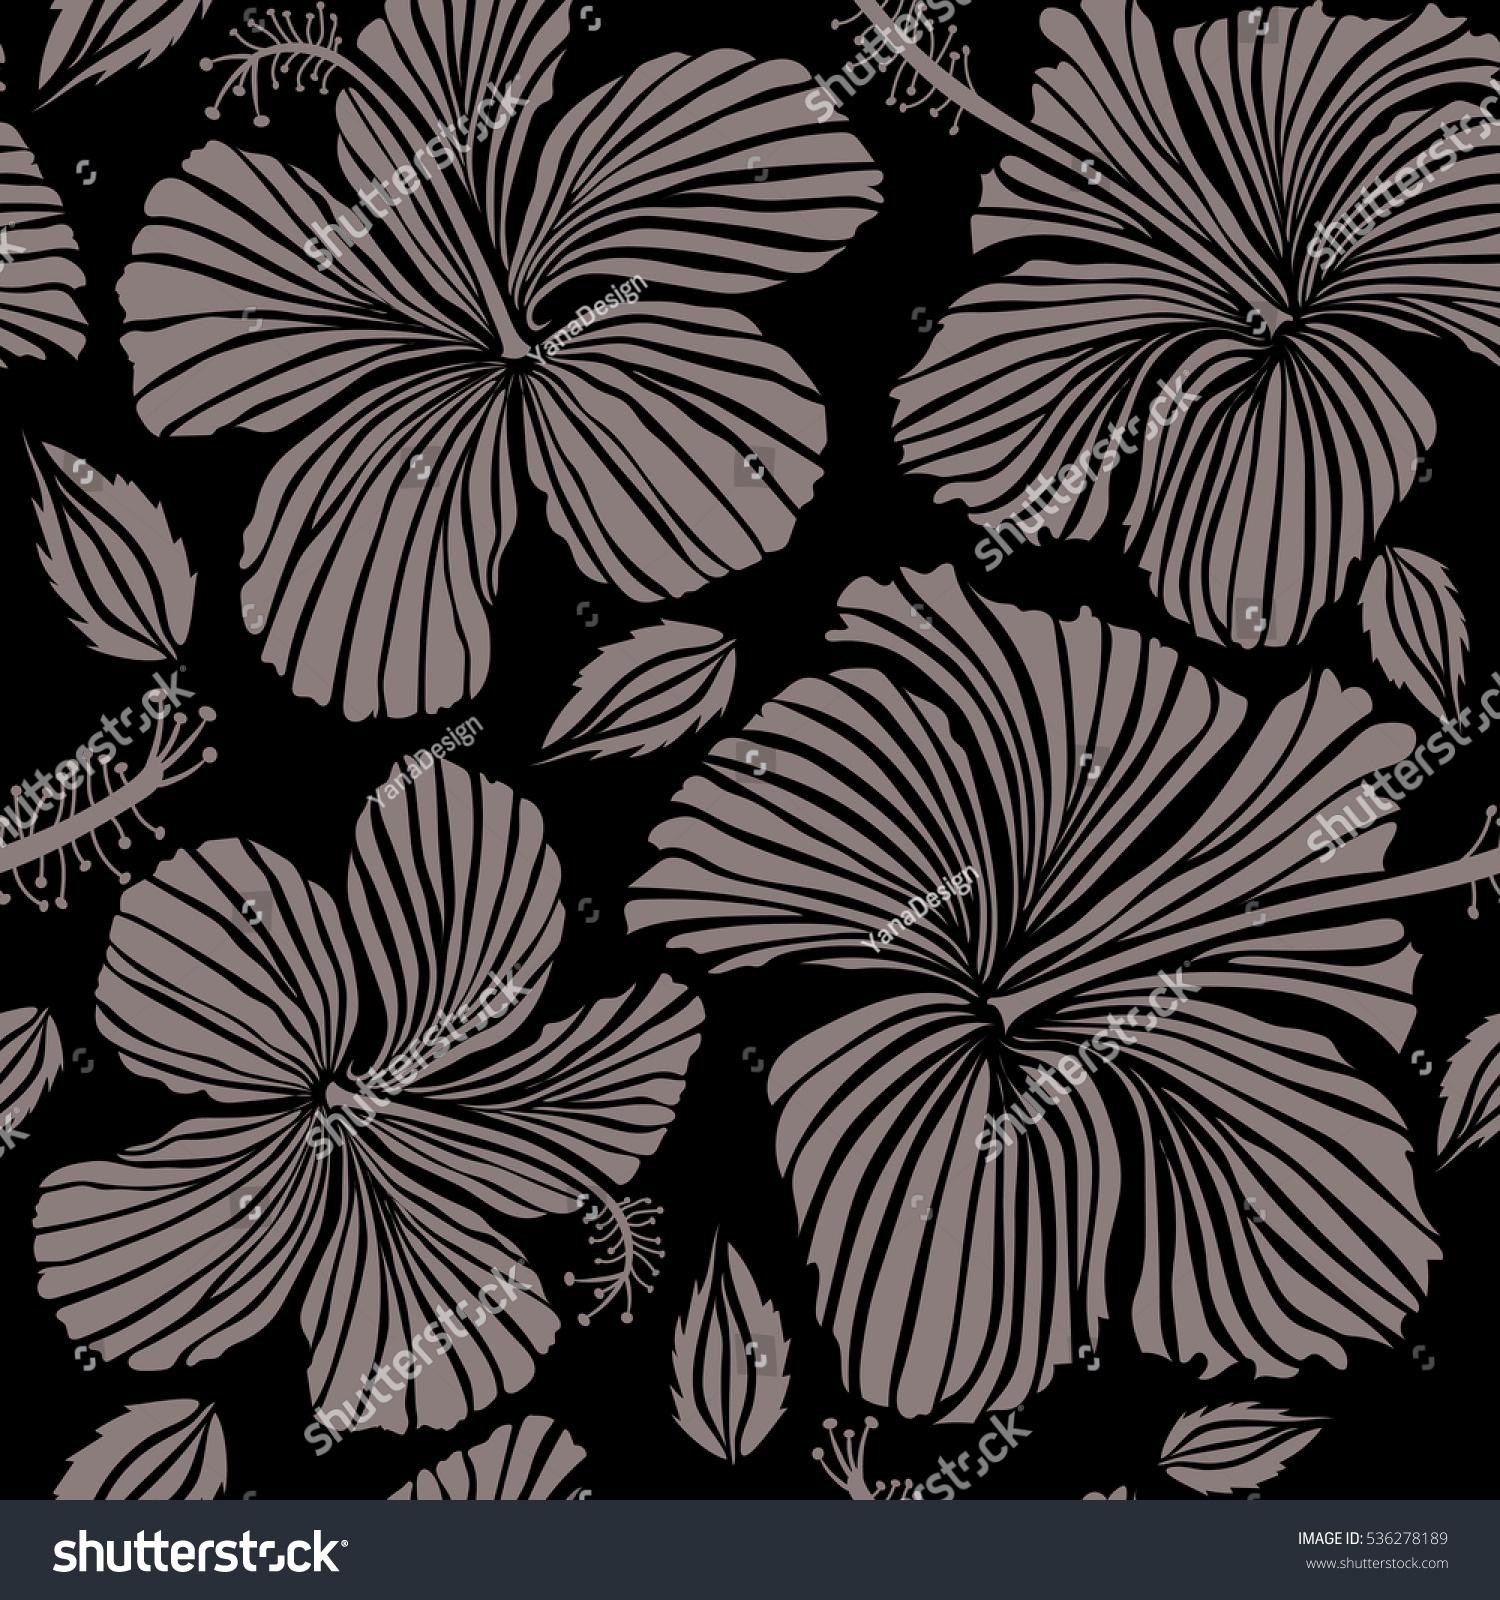 Hibiscus flowers on black background beige stock illustration hibiscus flowers on black background beige stock illustration 536278189 shutterstock izmirmasajfo